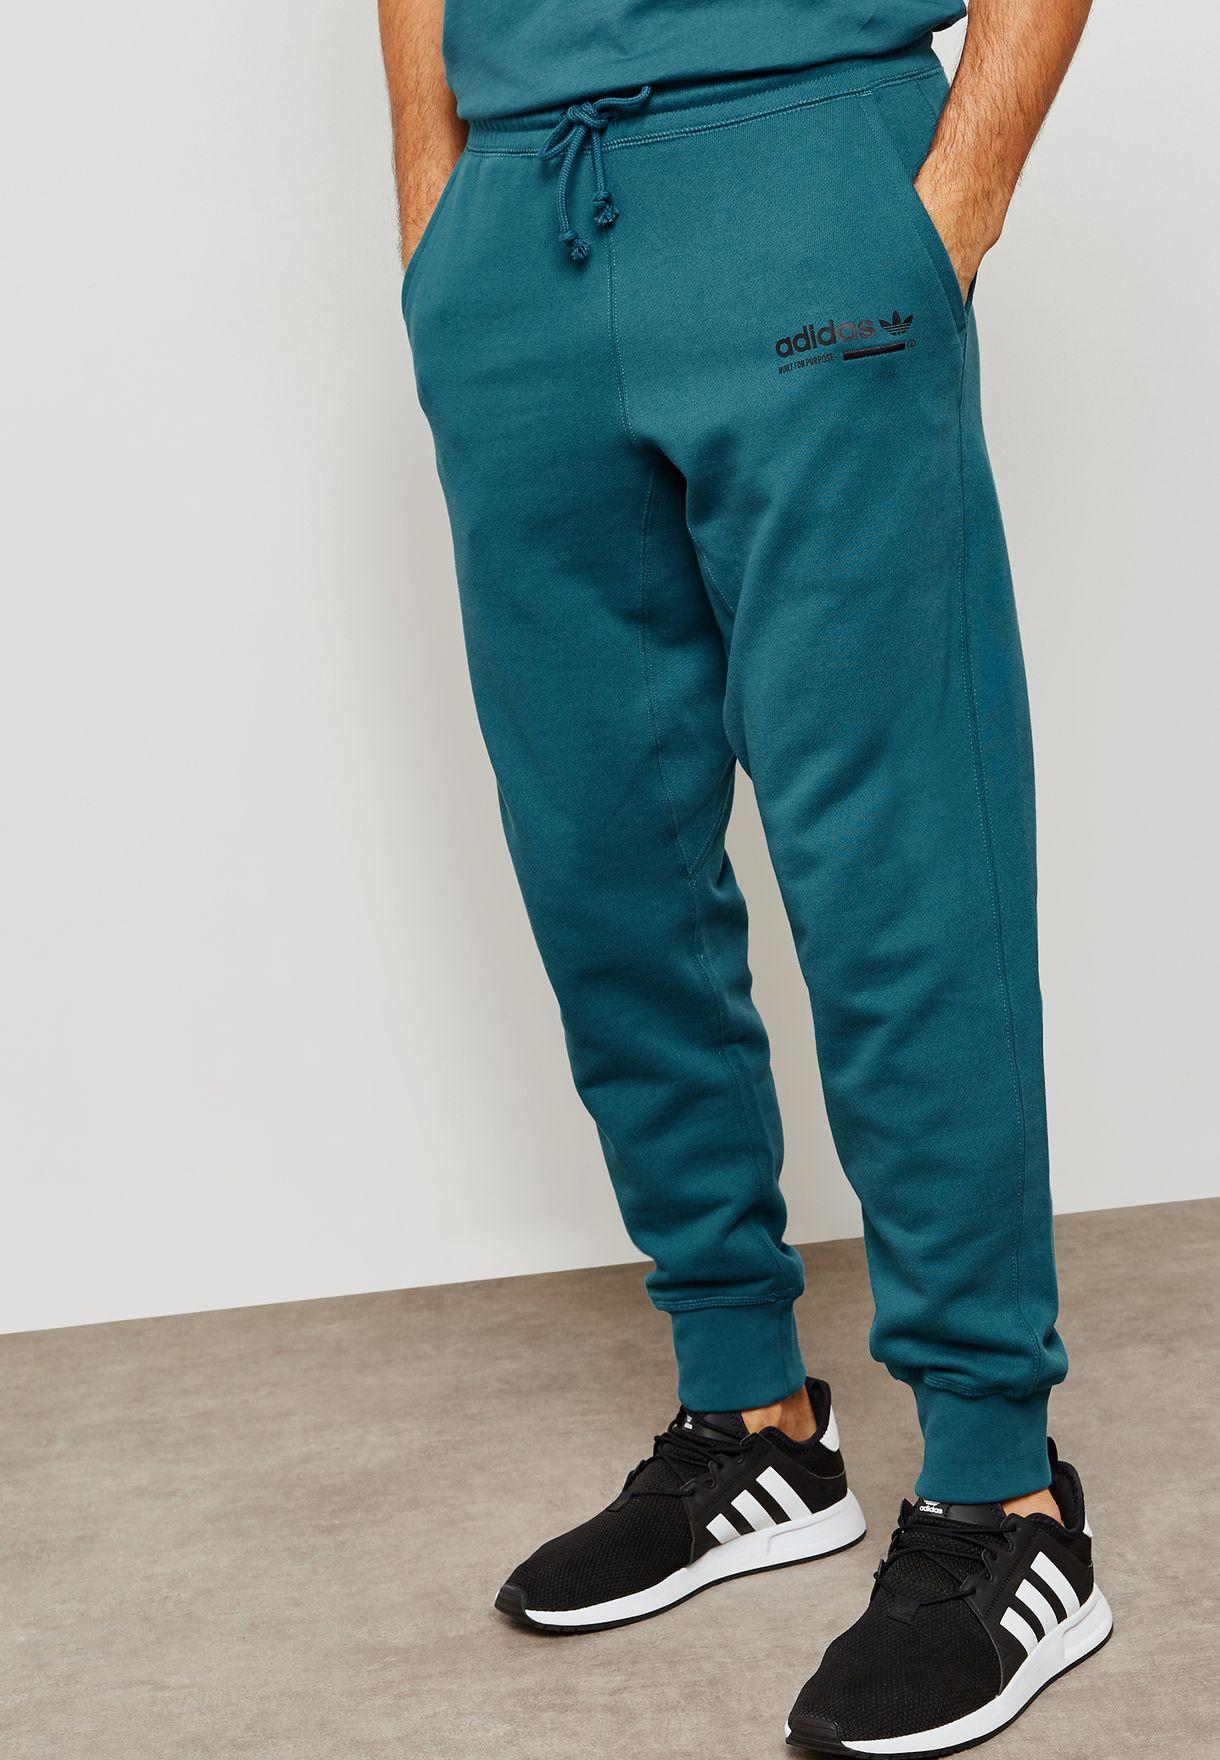 adidas Originals Kaval Sweat Pants - SPORTING GOODS Sports